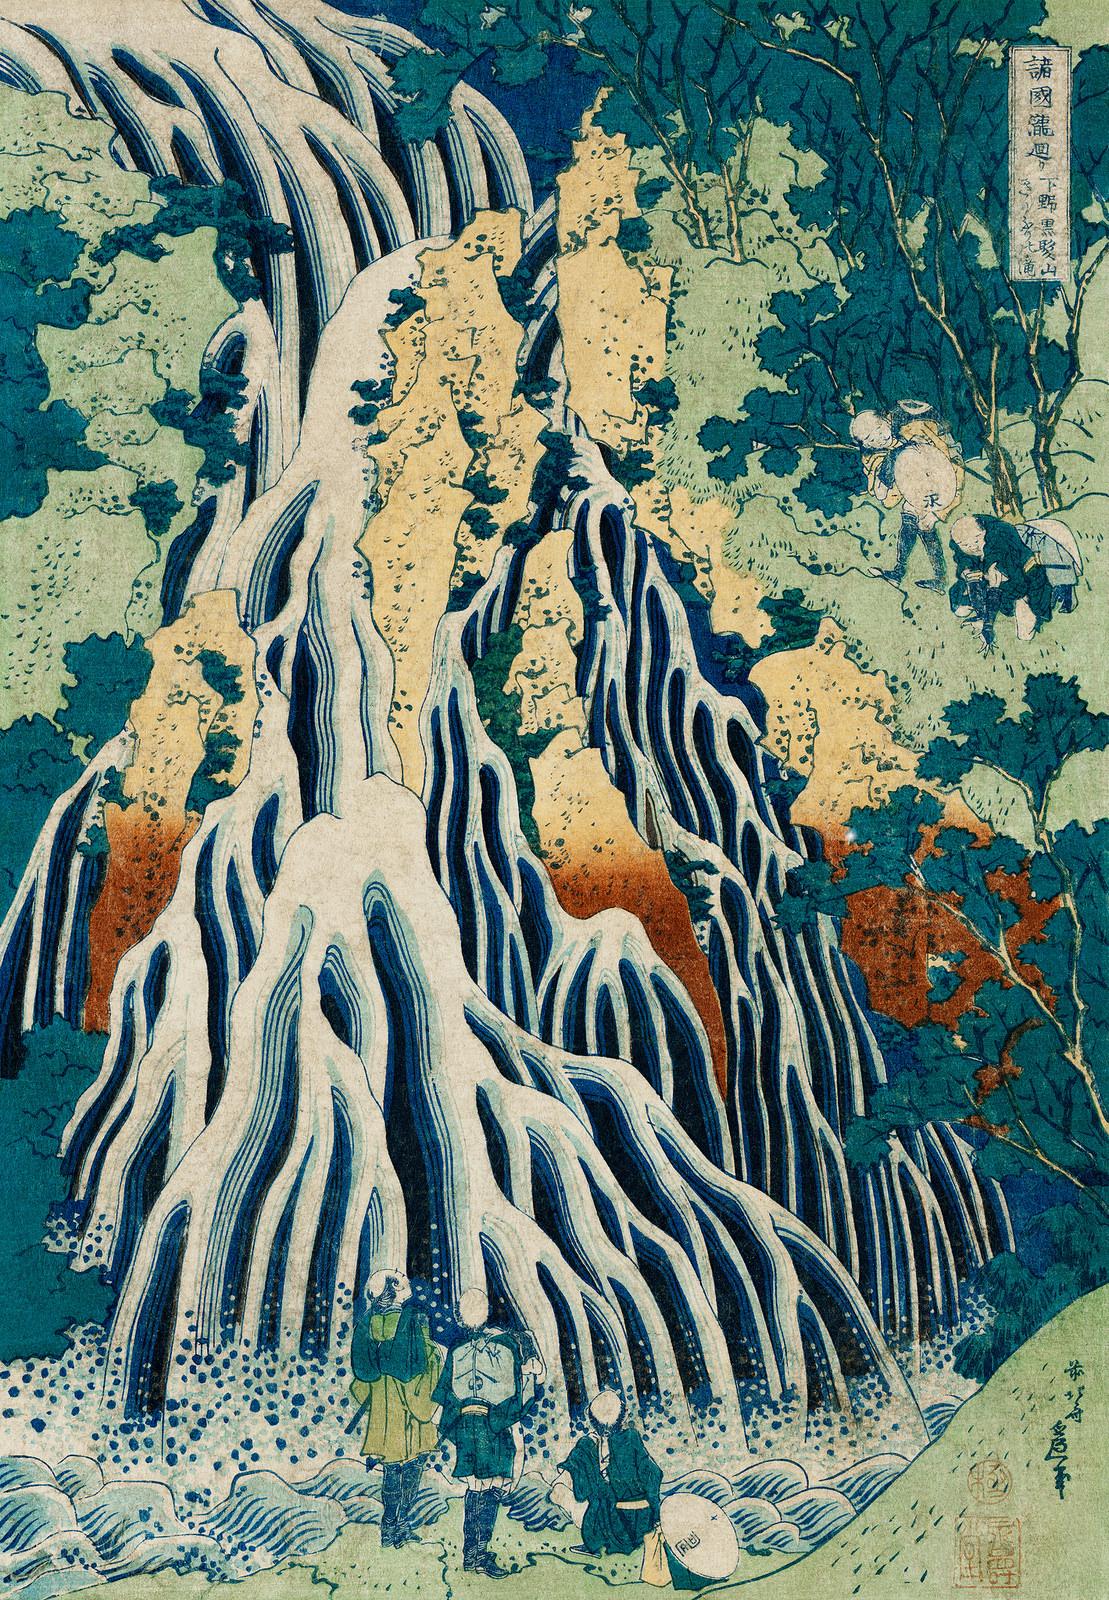 Shimotsuke Kurokami-Yama Kurifuri no Taki by Katsushika Hokusai (1760-1849) a traditional Japanese Ukyio-e style illustration of majestic Kirifuri Falls at Mount Kurokami in Shimosuke and sightseers. Digitally enhanced from our own original edition.